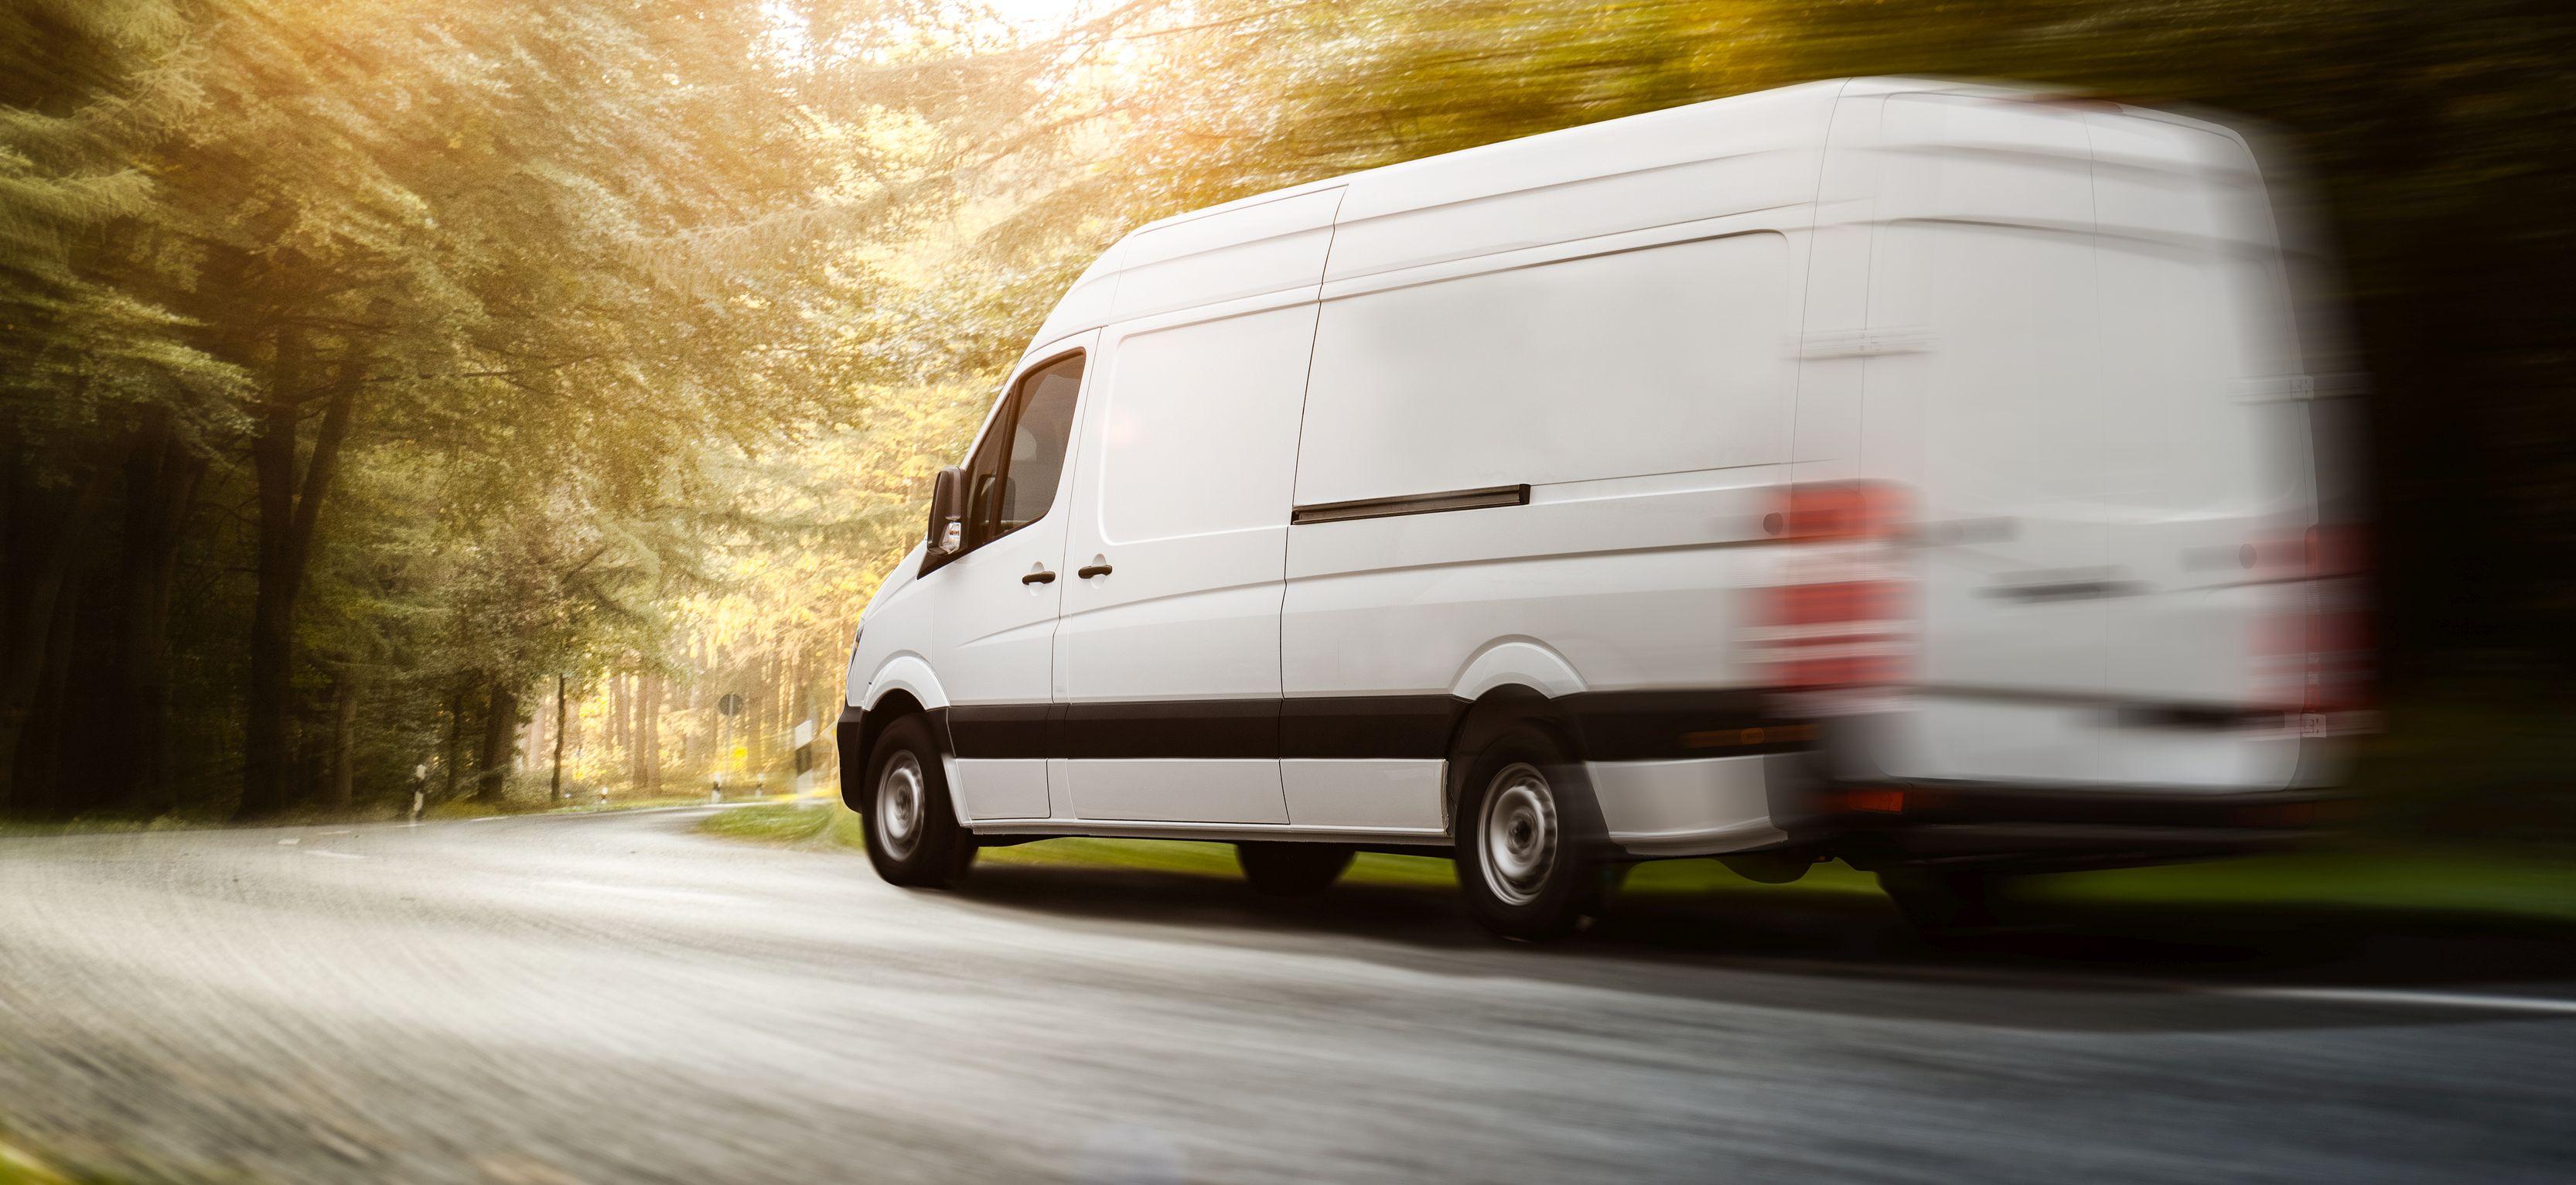 pay-as-you- go fleet insurance